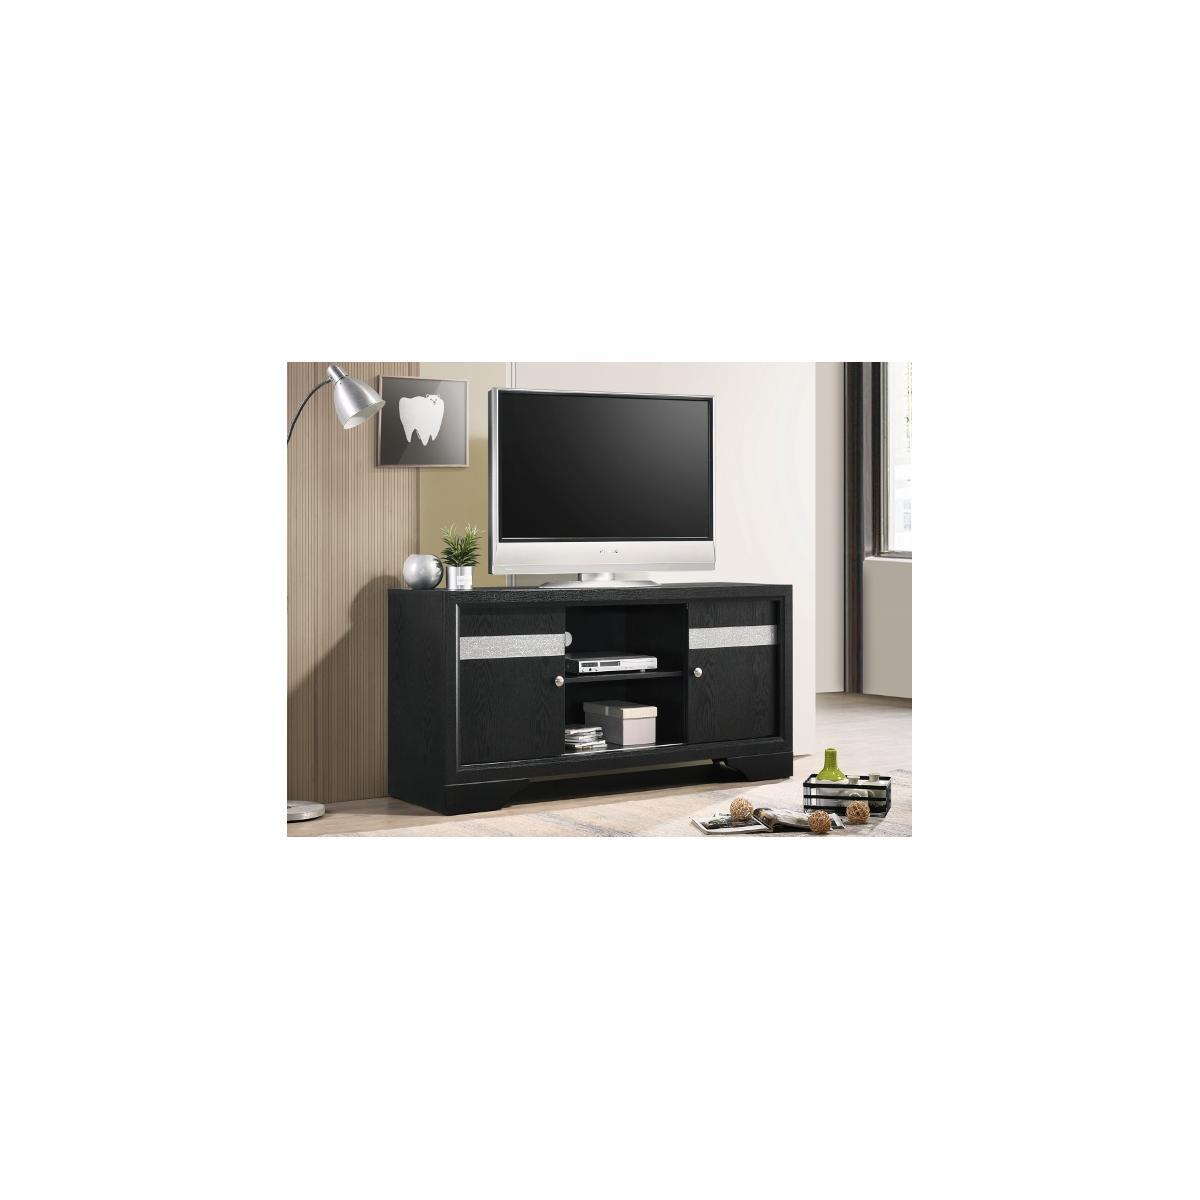 Regata TV Stand Blac